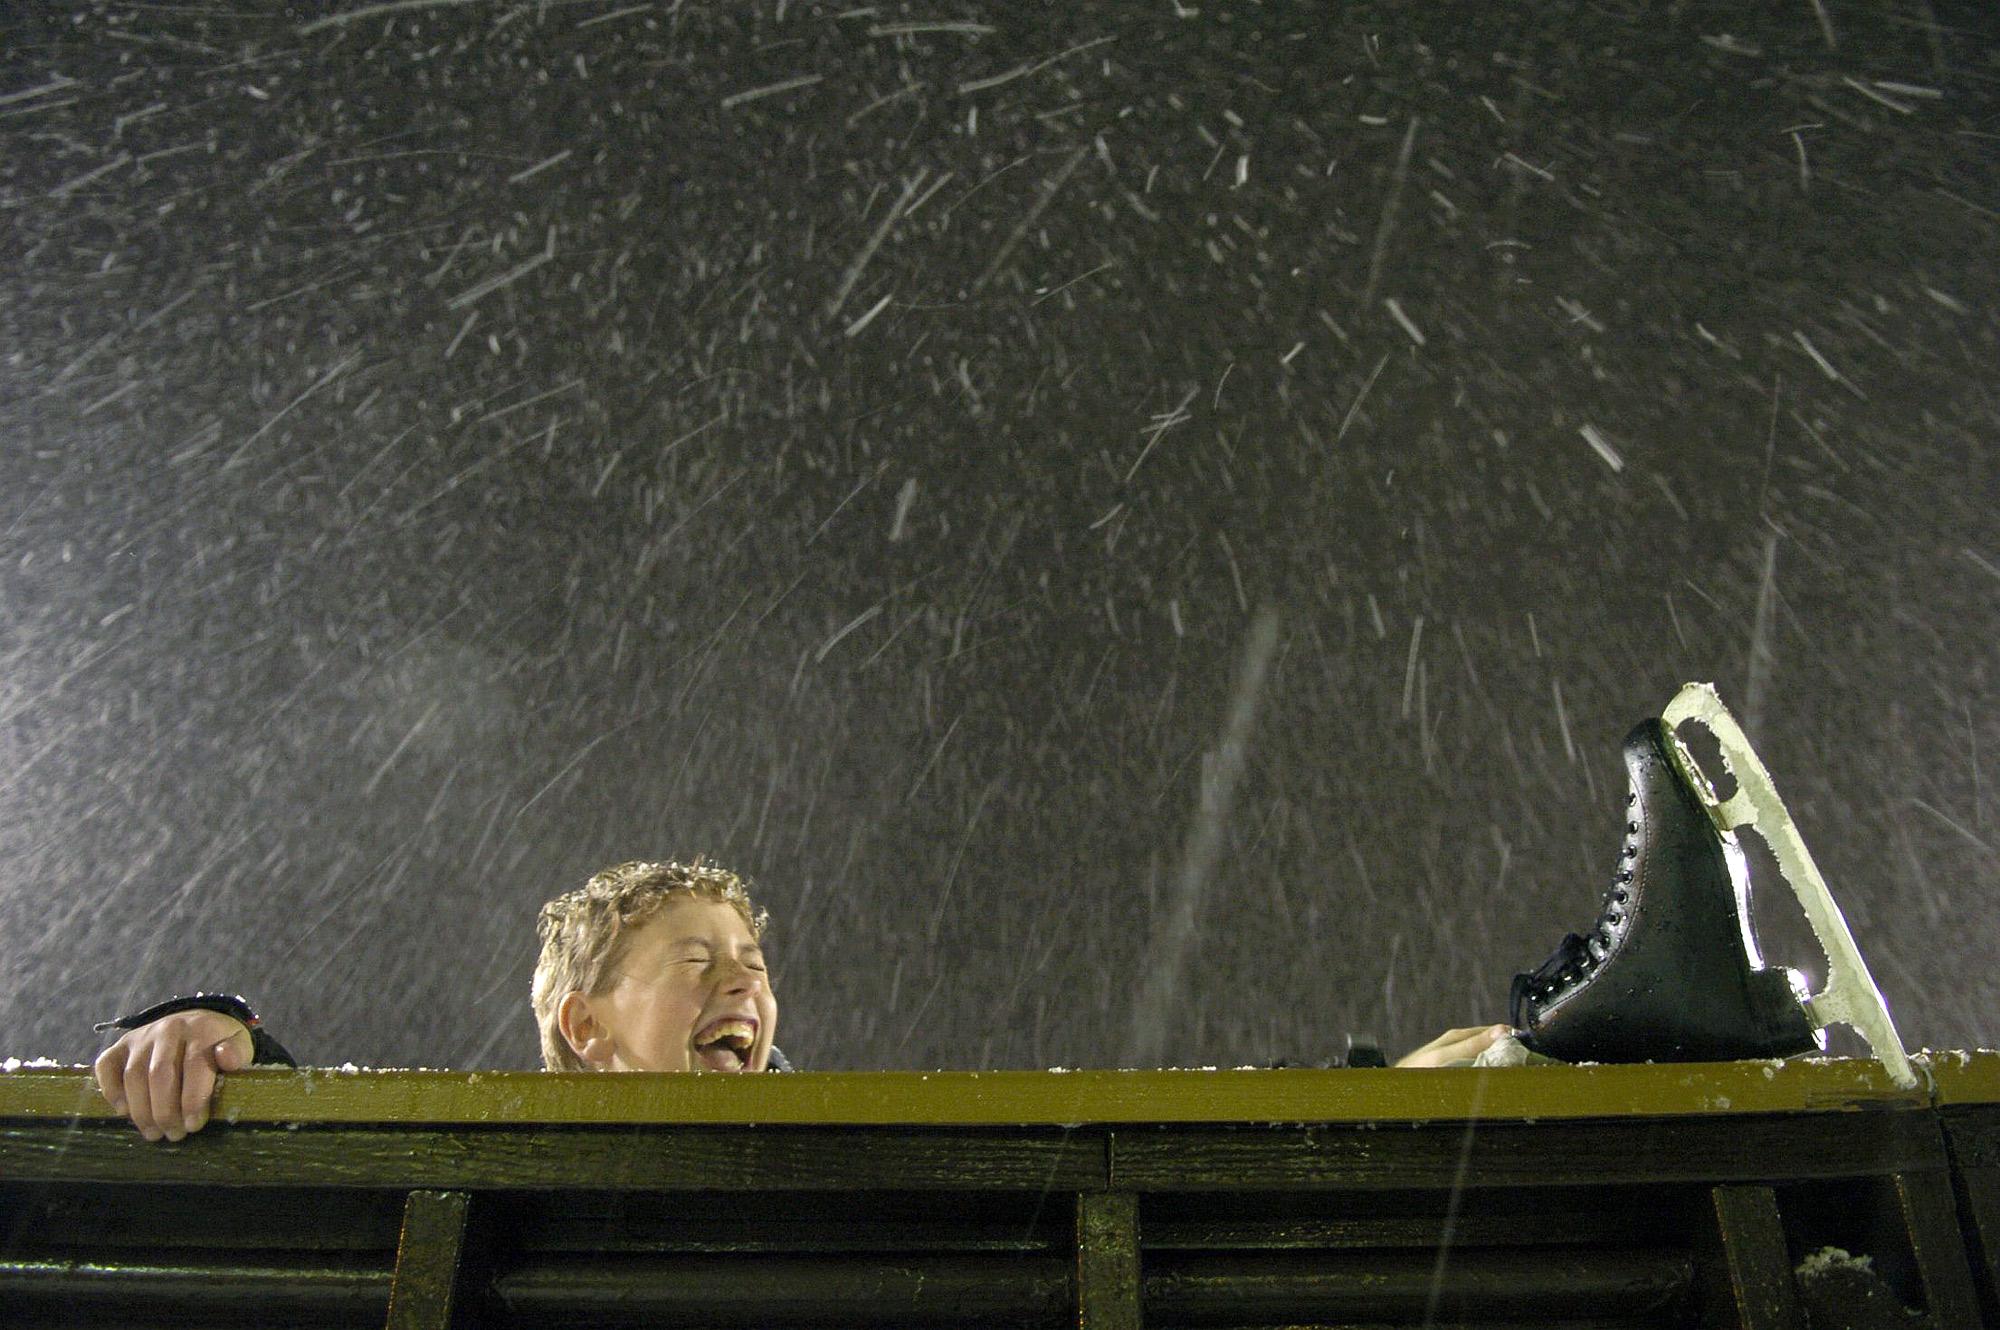 Joe Eisner has fun in a snowstorm at a Pittsburgh skating rink.